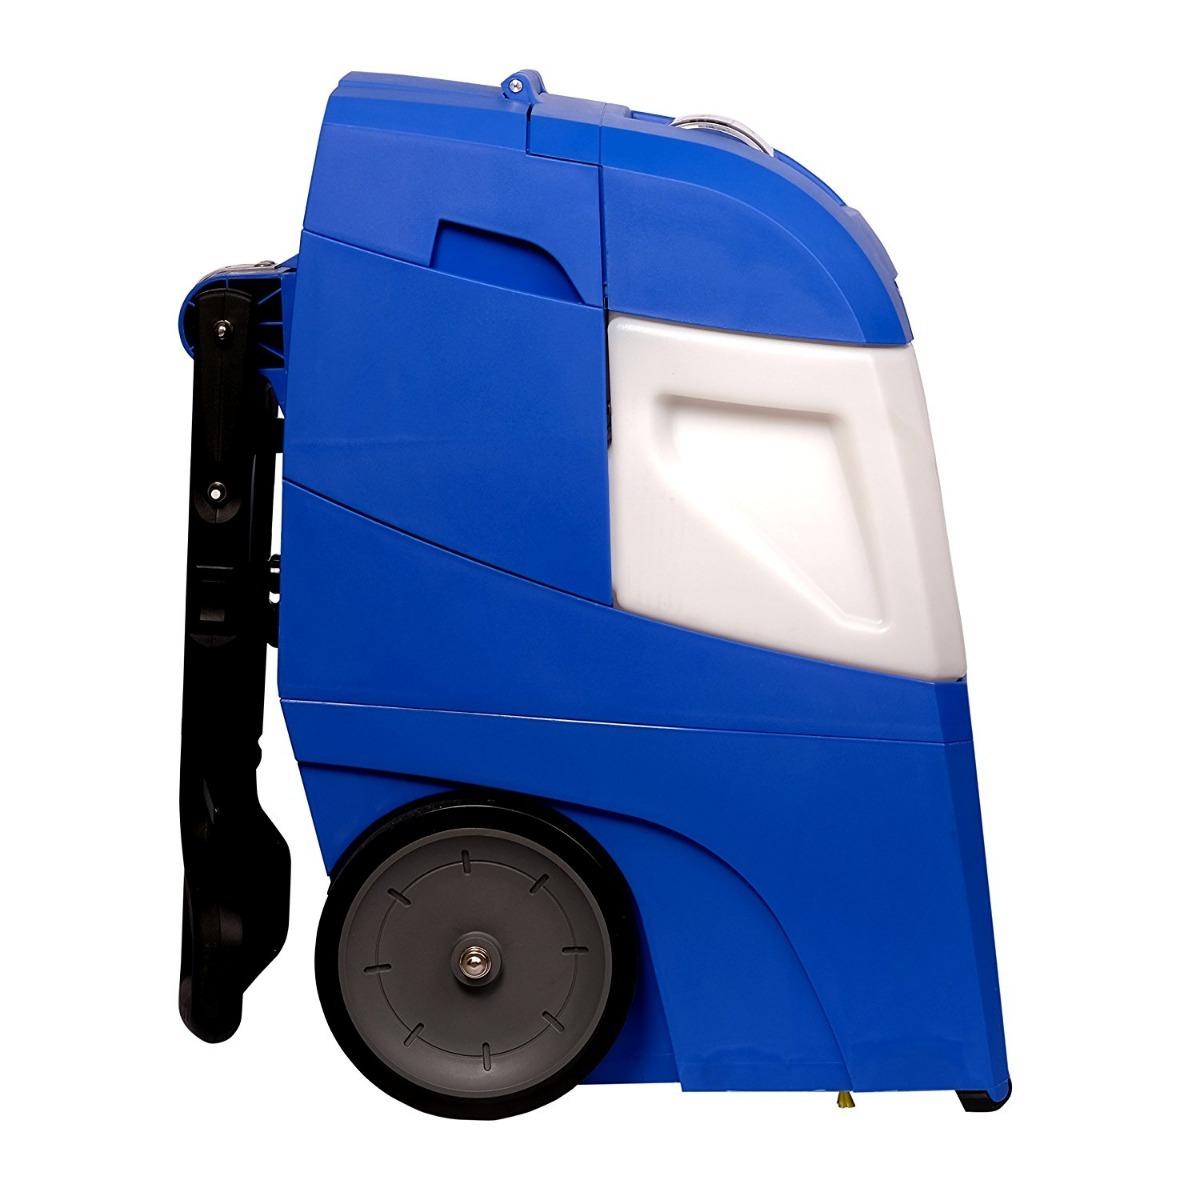 Maquina para lavar alfombras rug doctor x3 13 en mercado libre - Para lavar alfombras ...